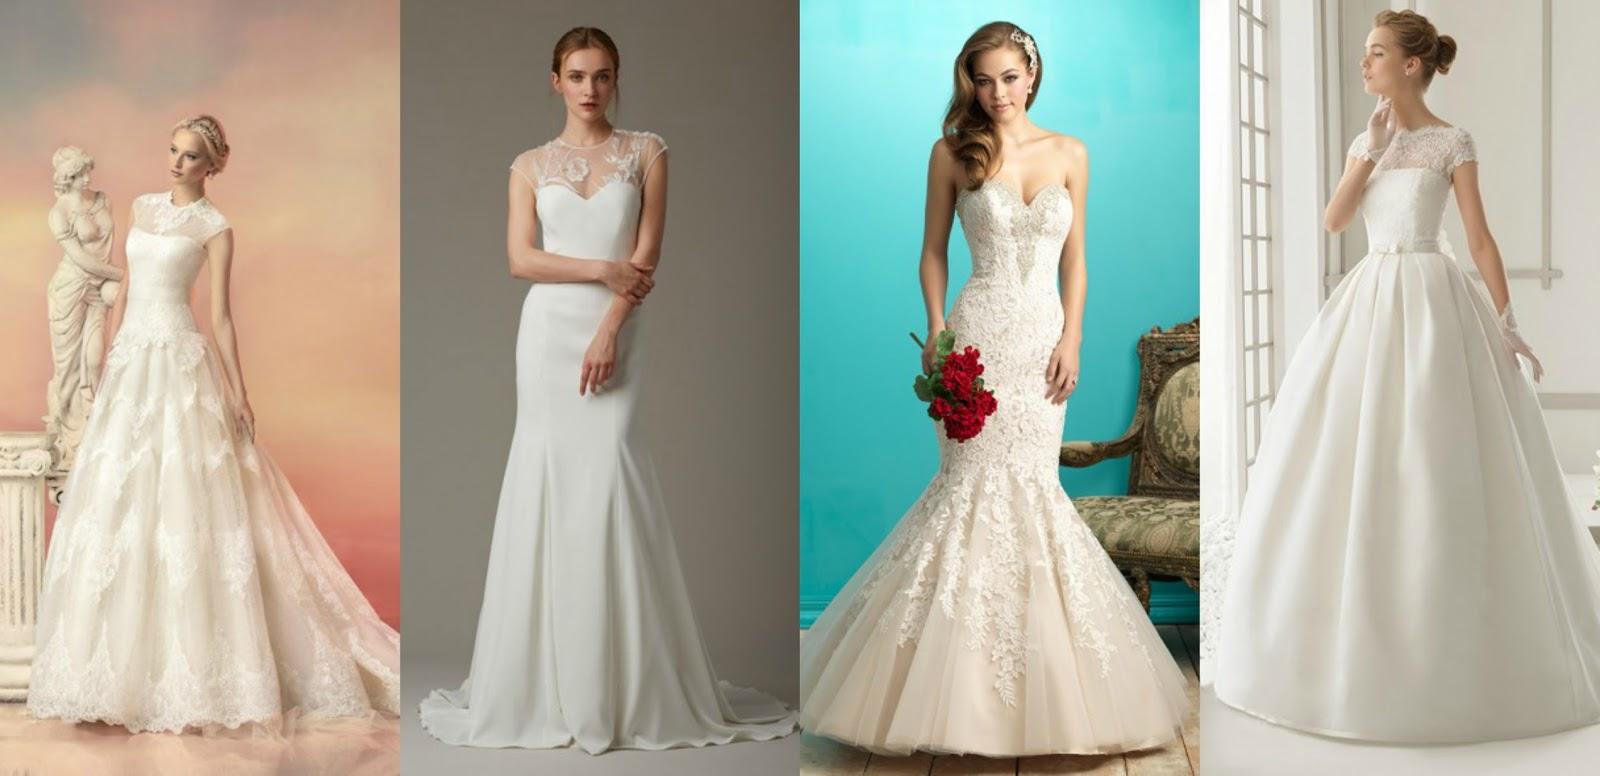 Fashionable Modern Day Vintage Wedding Dresses ...